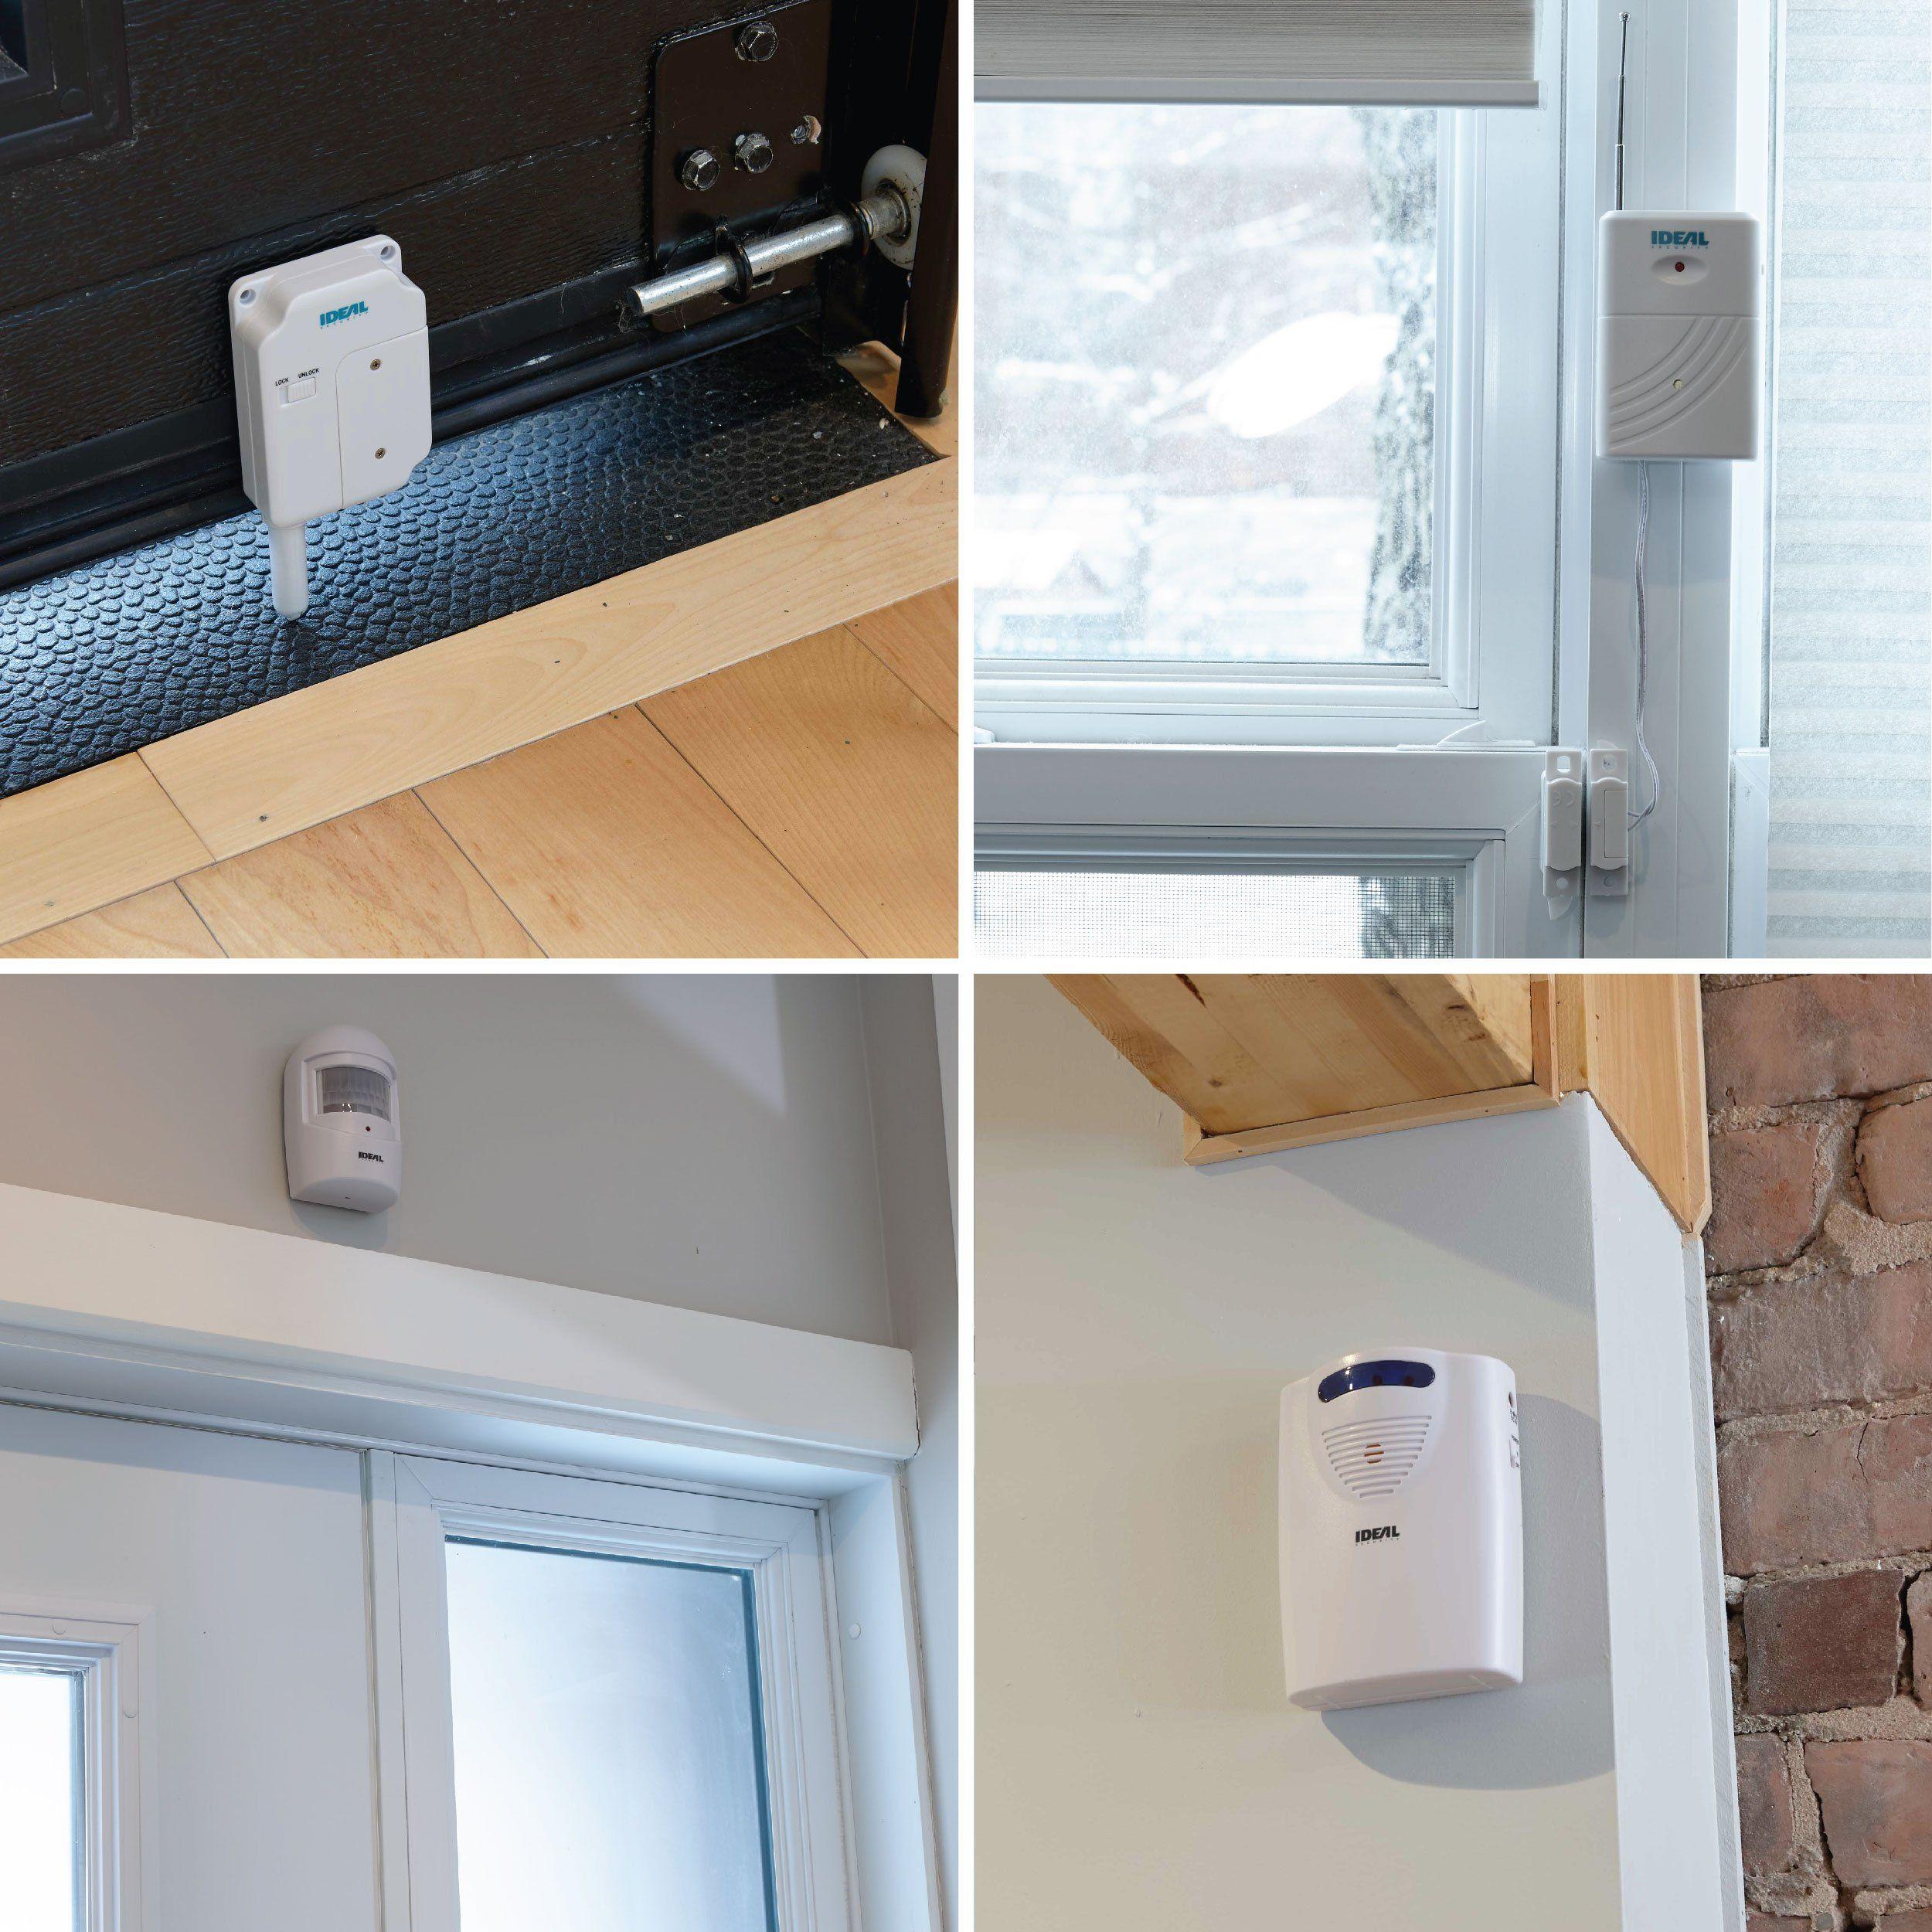 Ideal Security Sk646 Sk6series Wireless Garage Door Sensor Works With Sk6 Alarms White Continuously The Product Garage Door Sensor Home Security Home Alarm